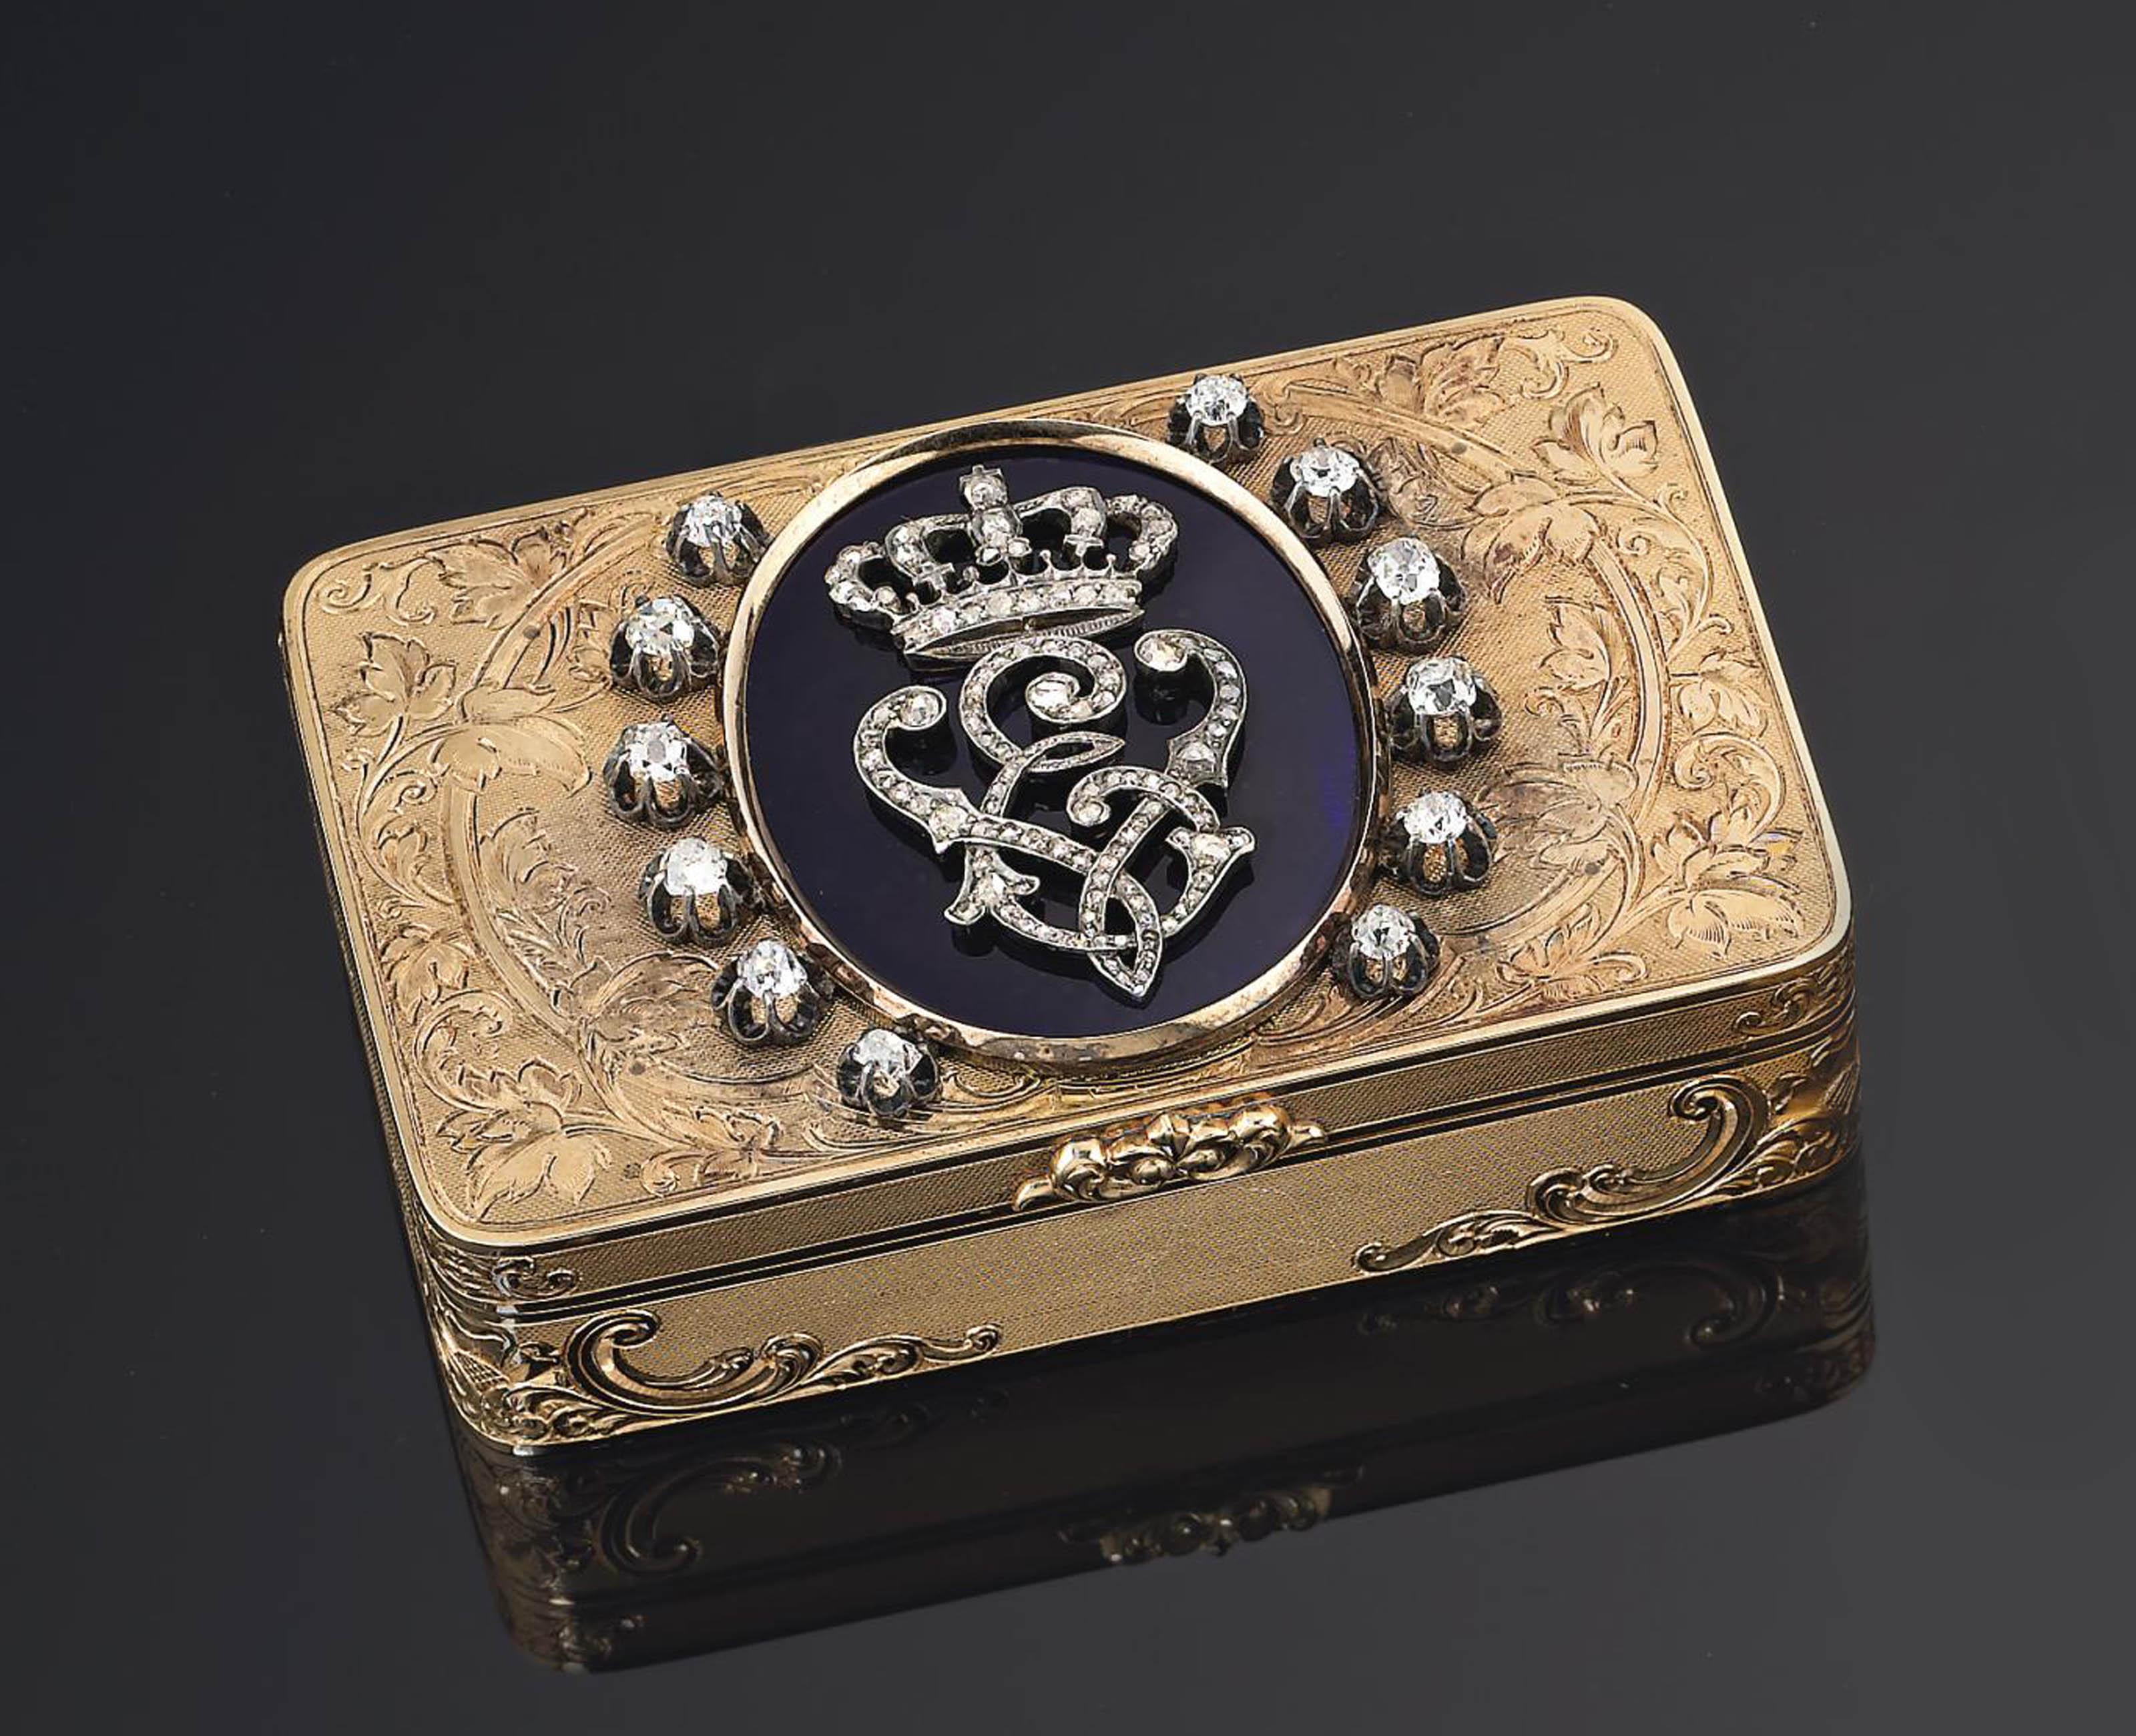 A ITALIAN ROYAL JEWELLED ENAMELLED GOLD PRESENTATION SNUFF-BOX